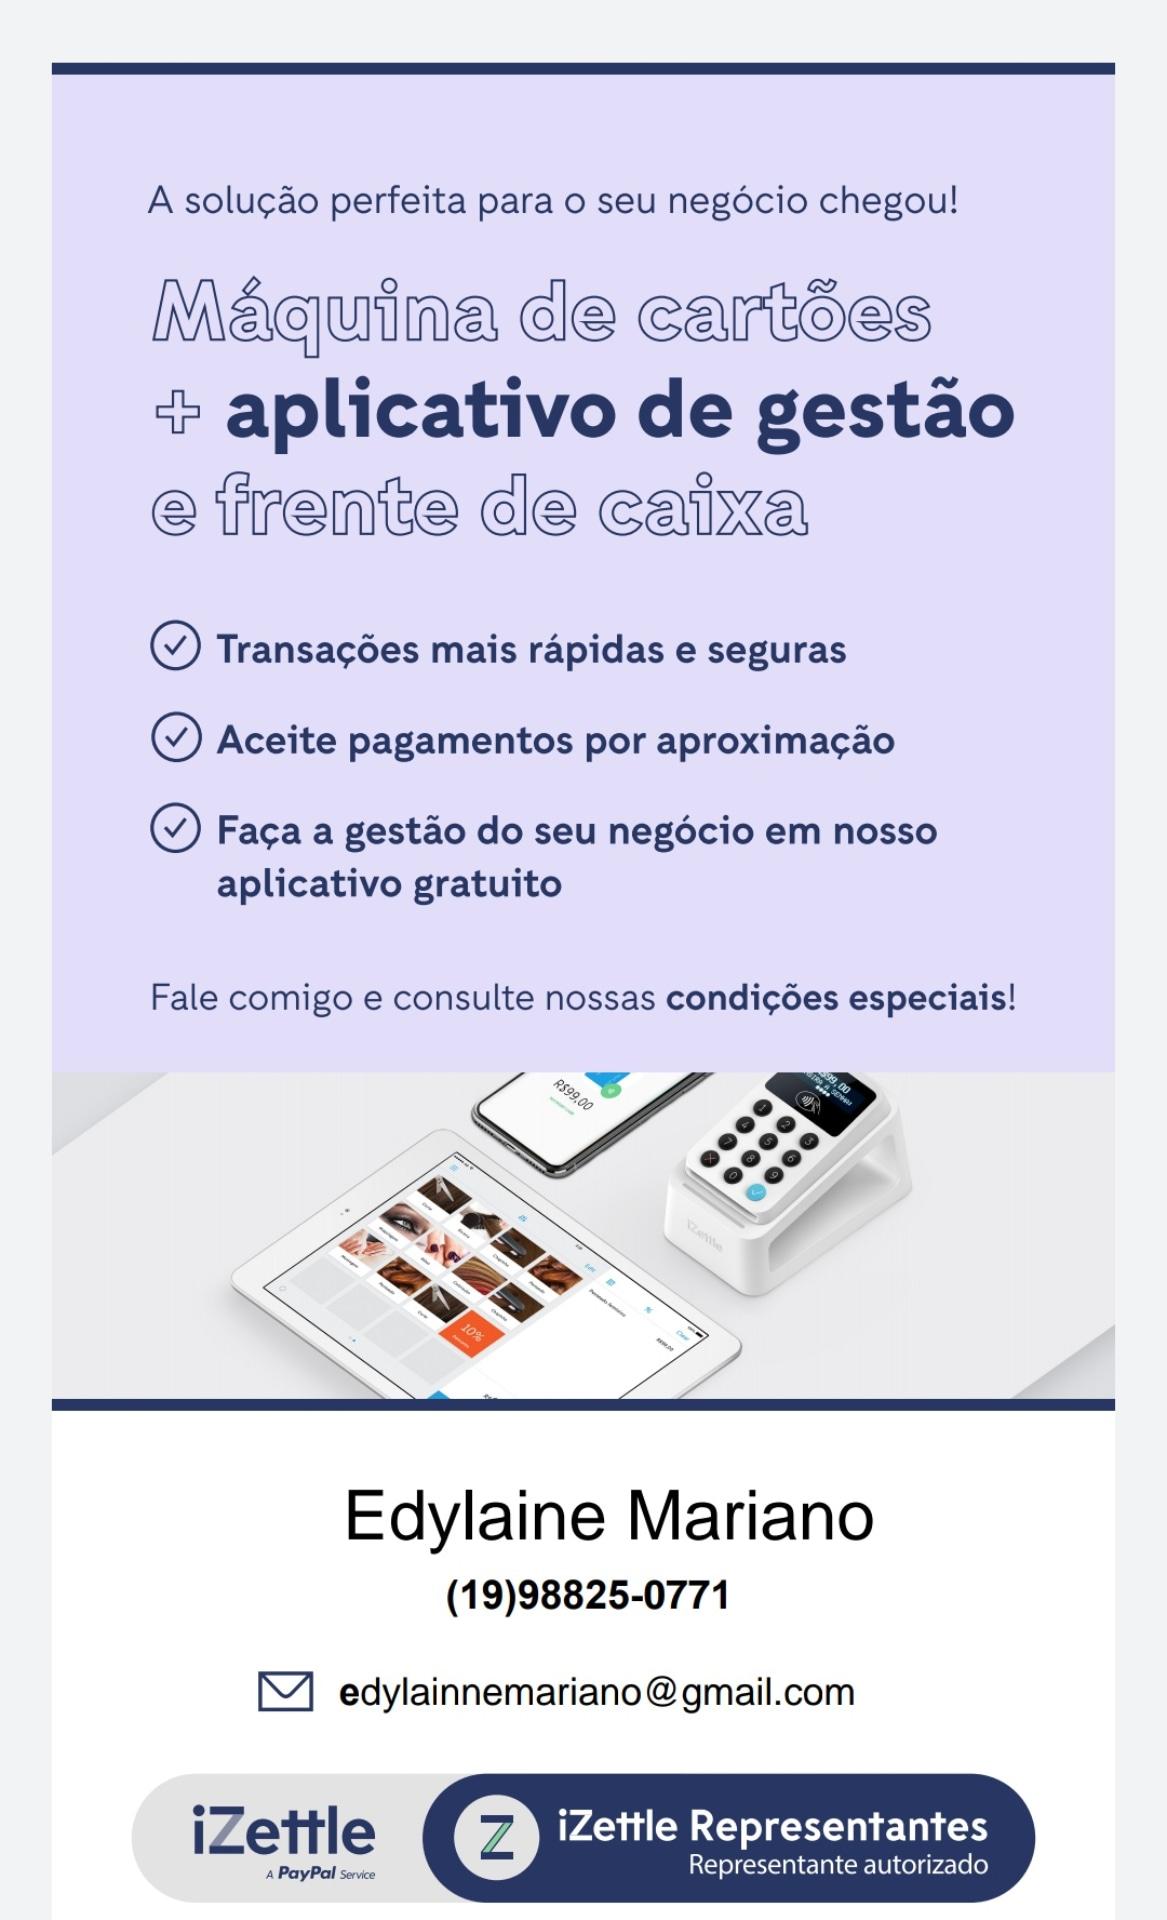 EDYLAINE APARECIDA FERREIRA MARIANO 36117542852